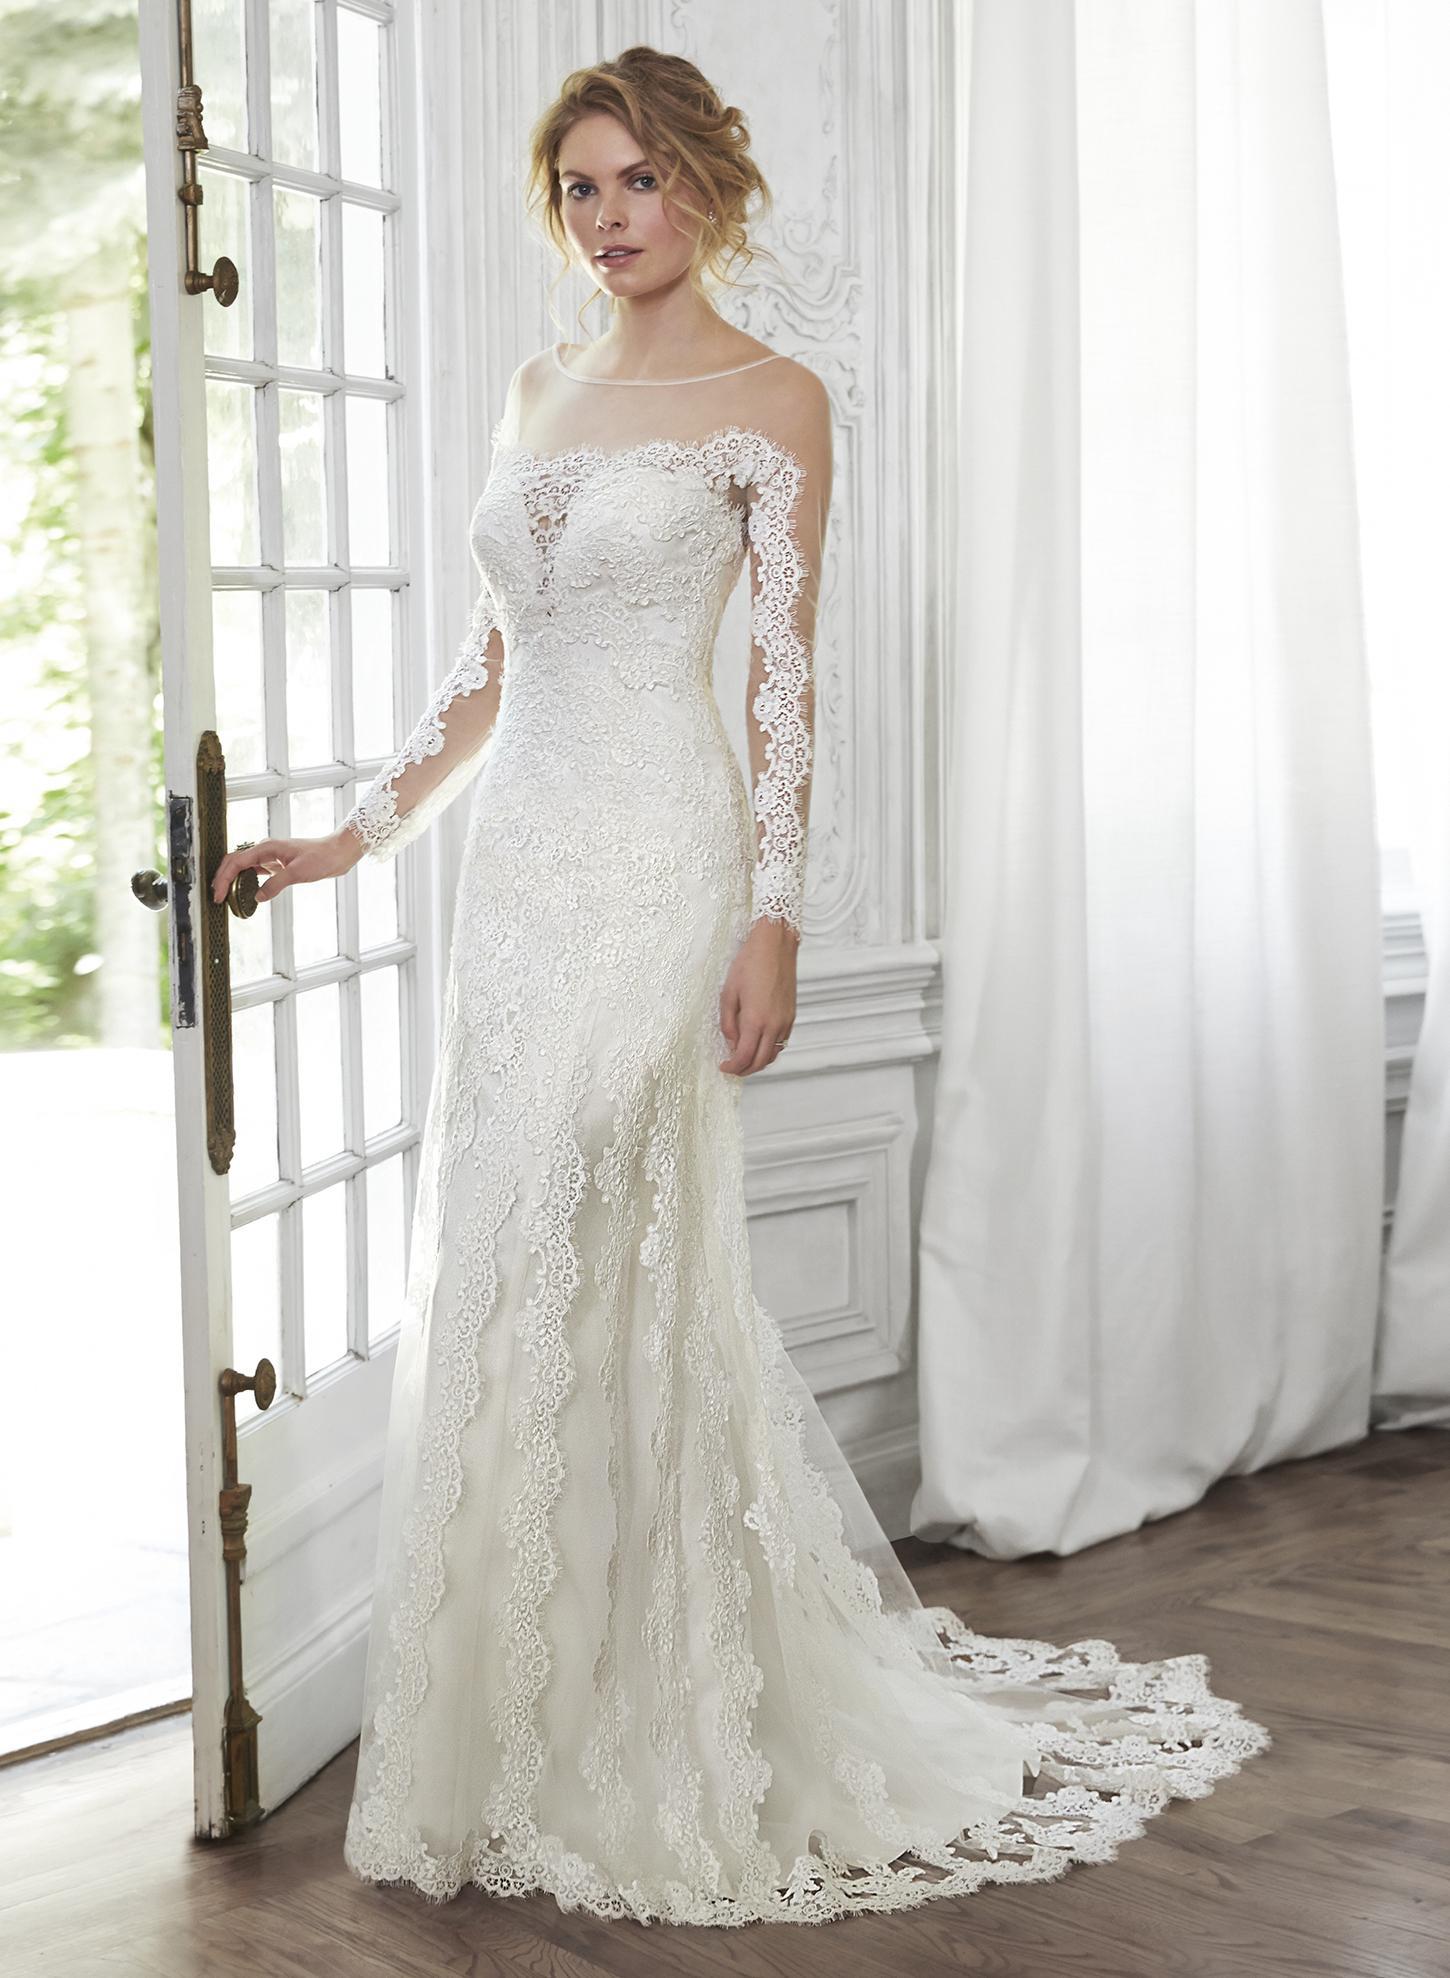 V Neck Long Sleeved Lace Patterns Sheath Wedding Dress